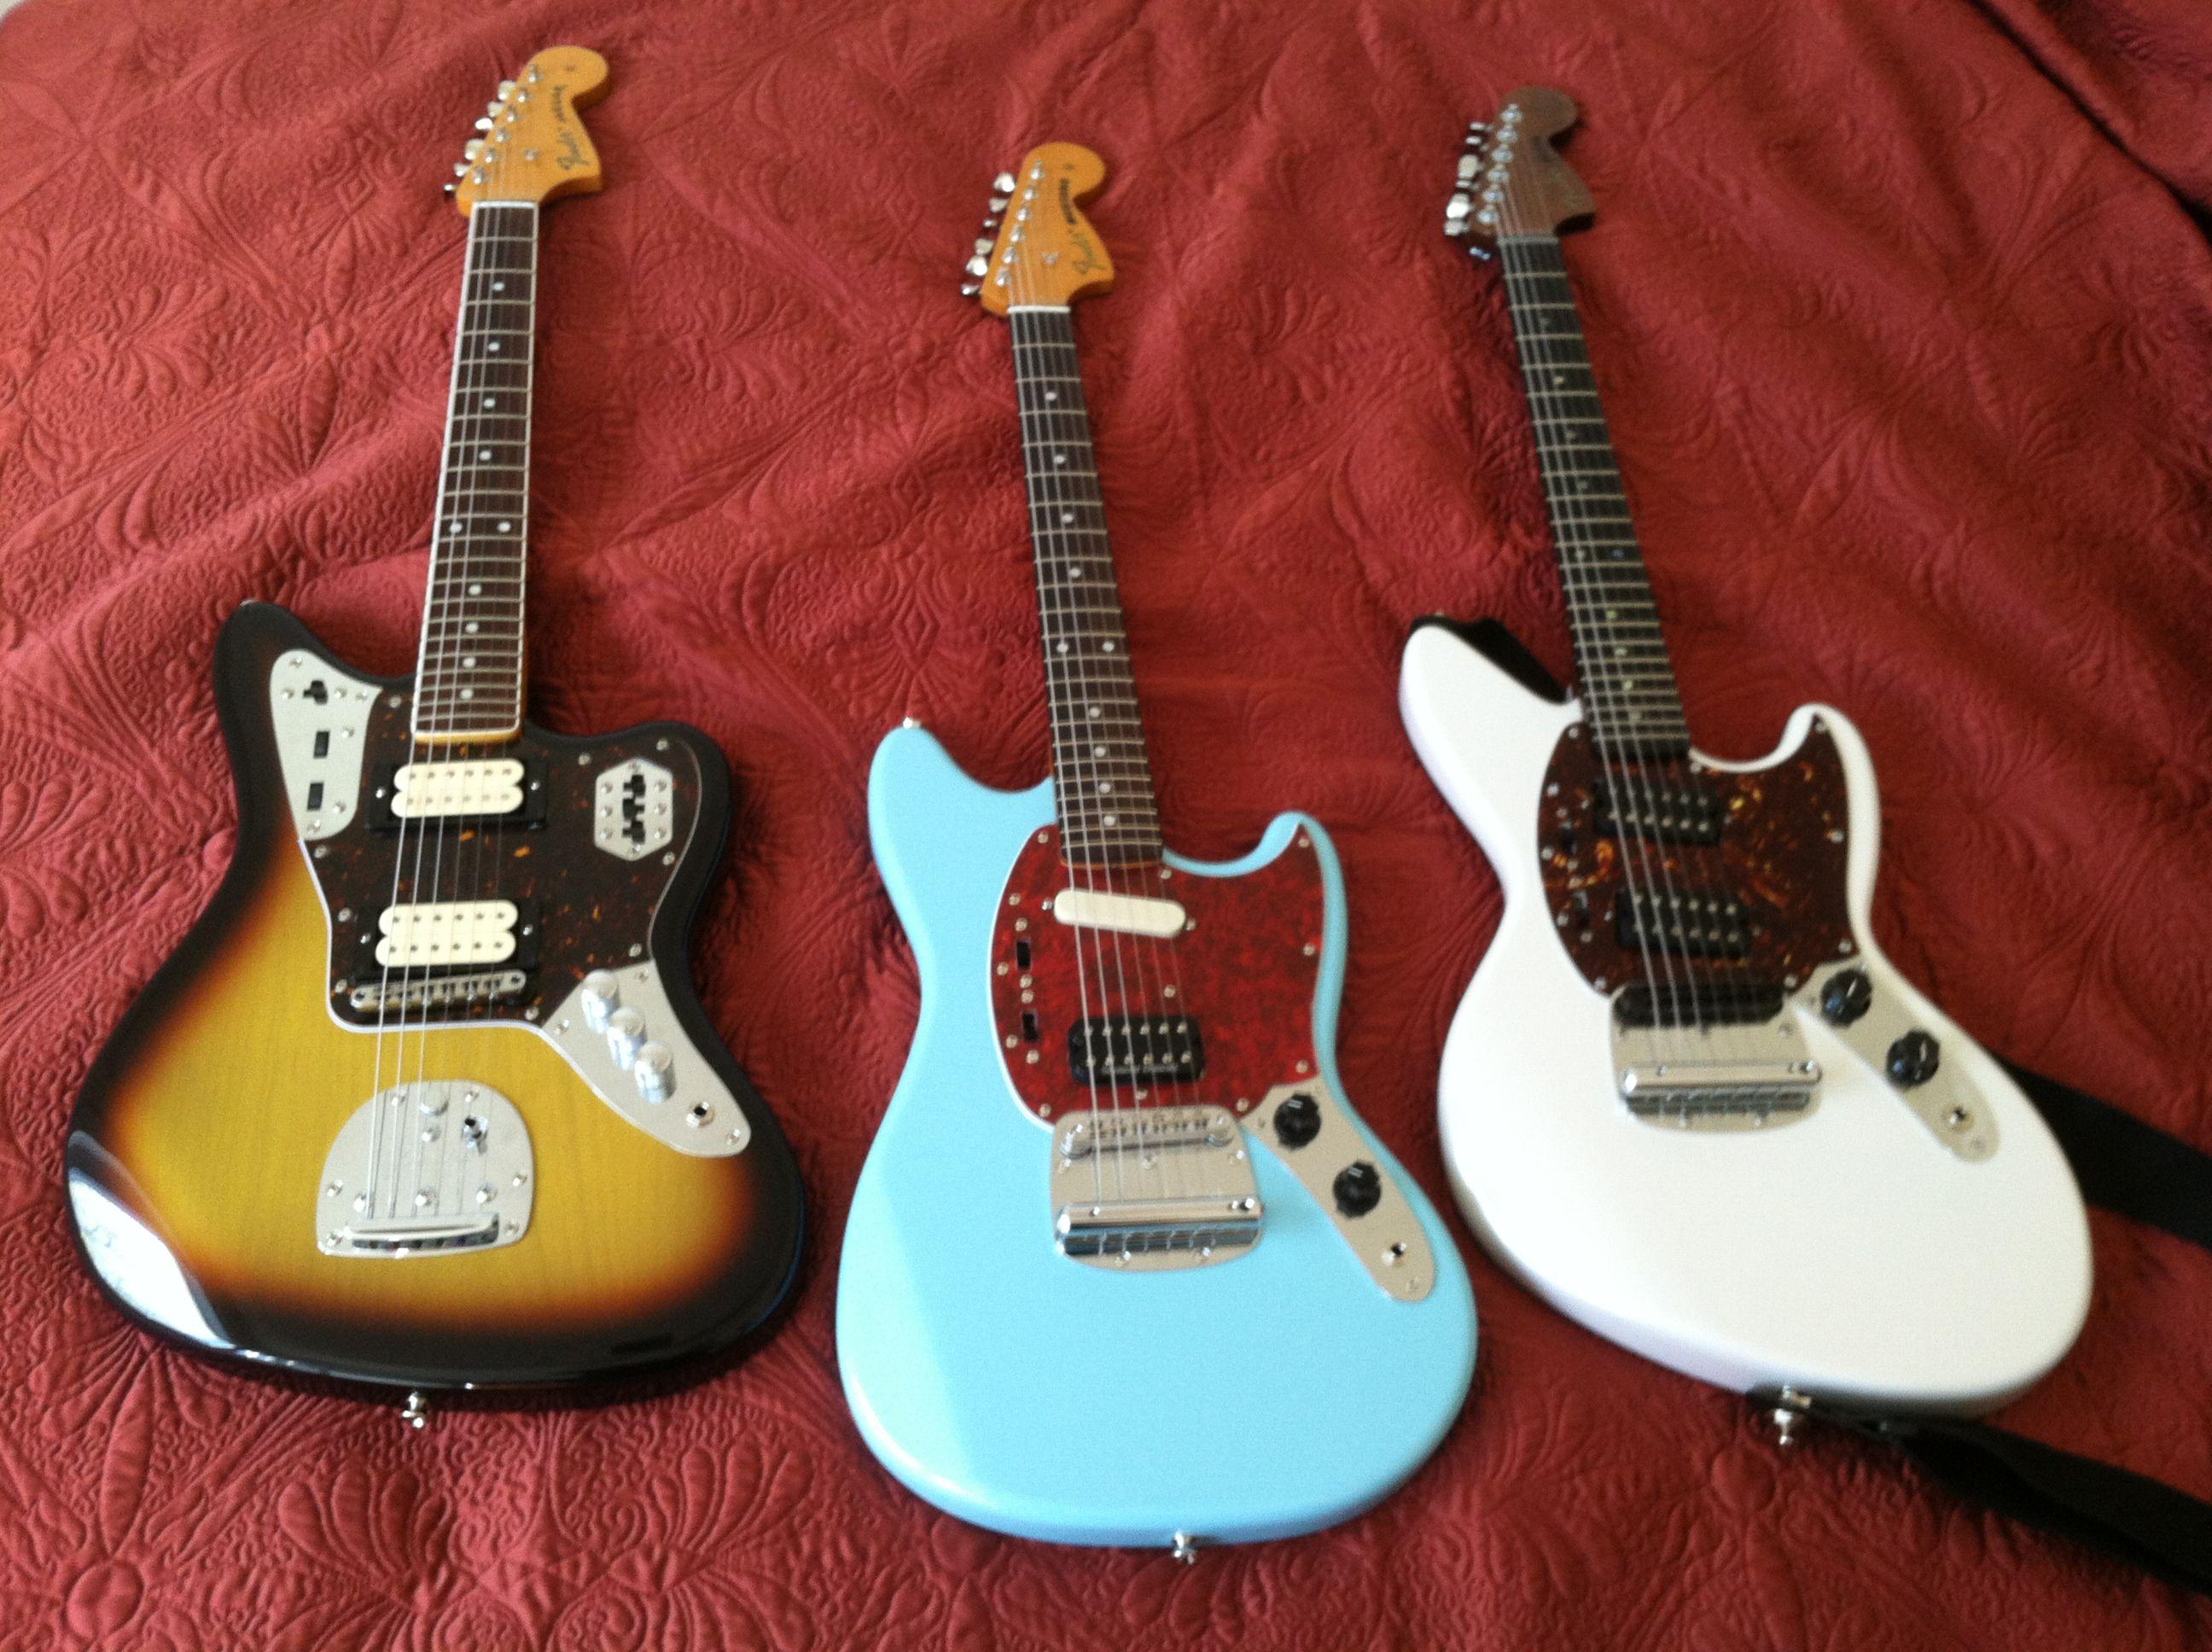 Fender Japan Jaguar, Mustang, Jagstang. All Kurt Cobain guitars.